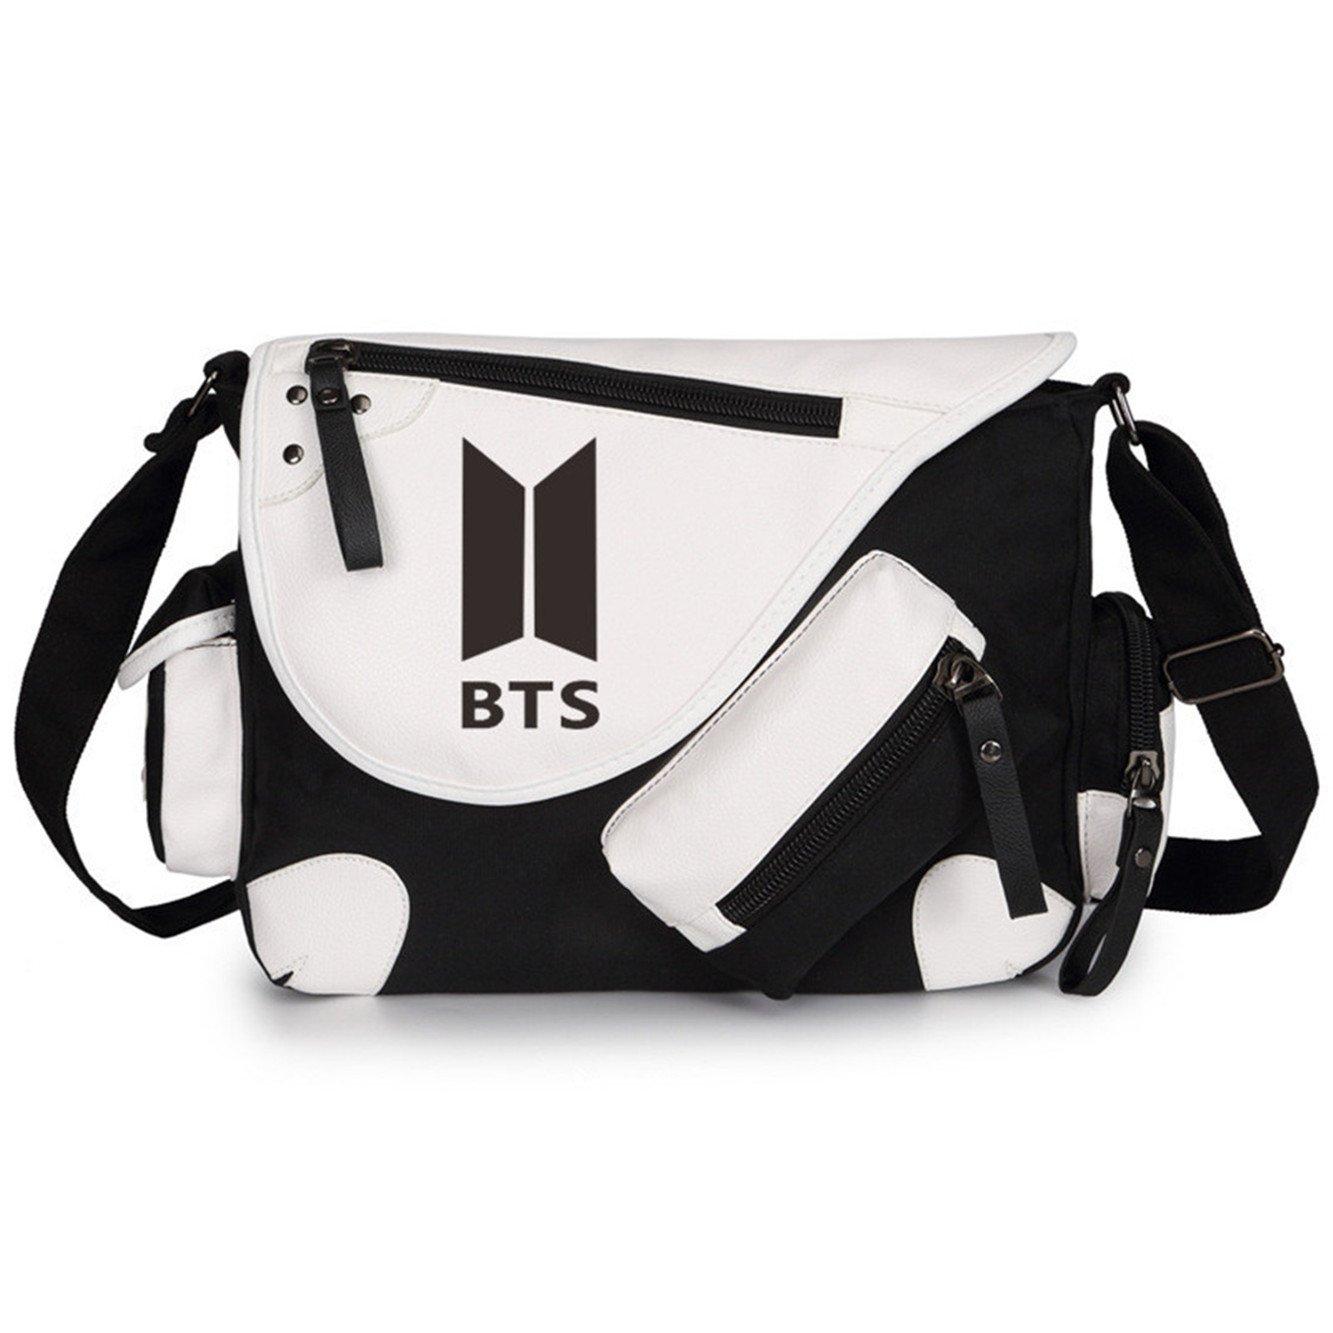 JUSTGOGO BTS Bangtan boys Messenger Bag Cross-body Bag Shoulder Bag Travel Bag Handbag Tote Bag (Black 1)